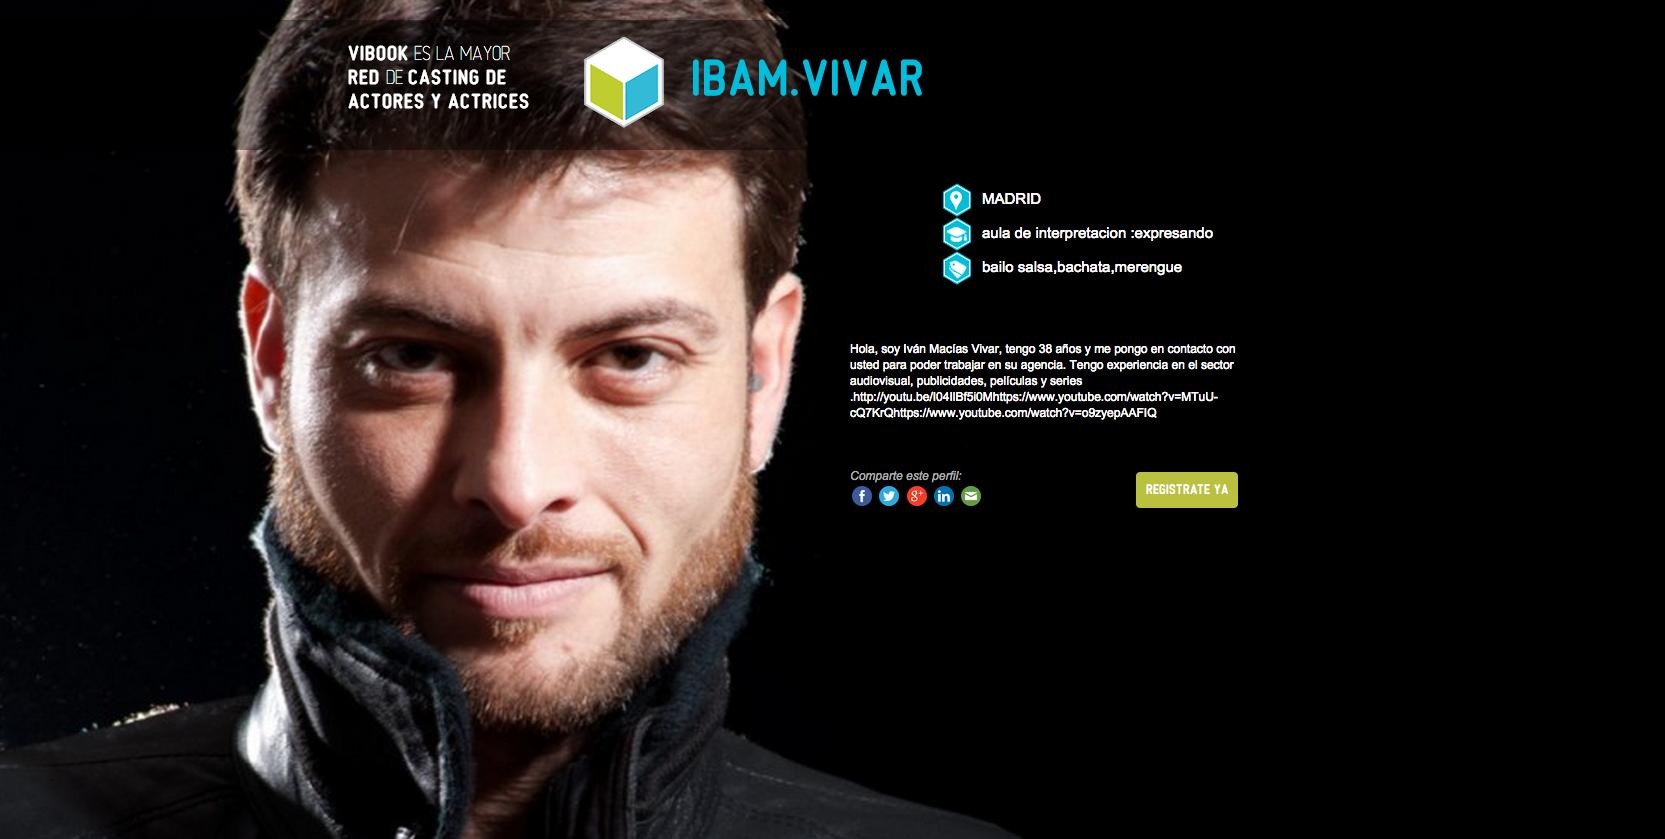 Actor IBAM VIVAR